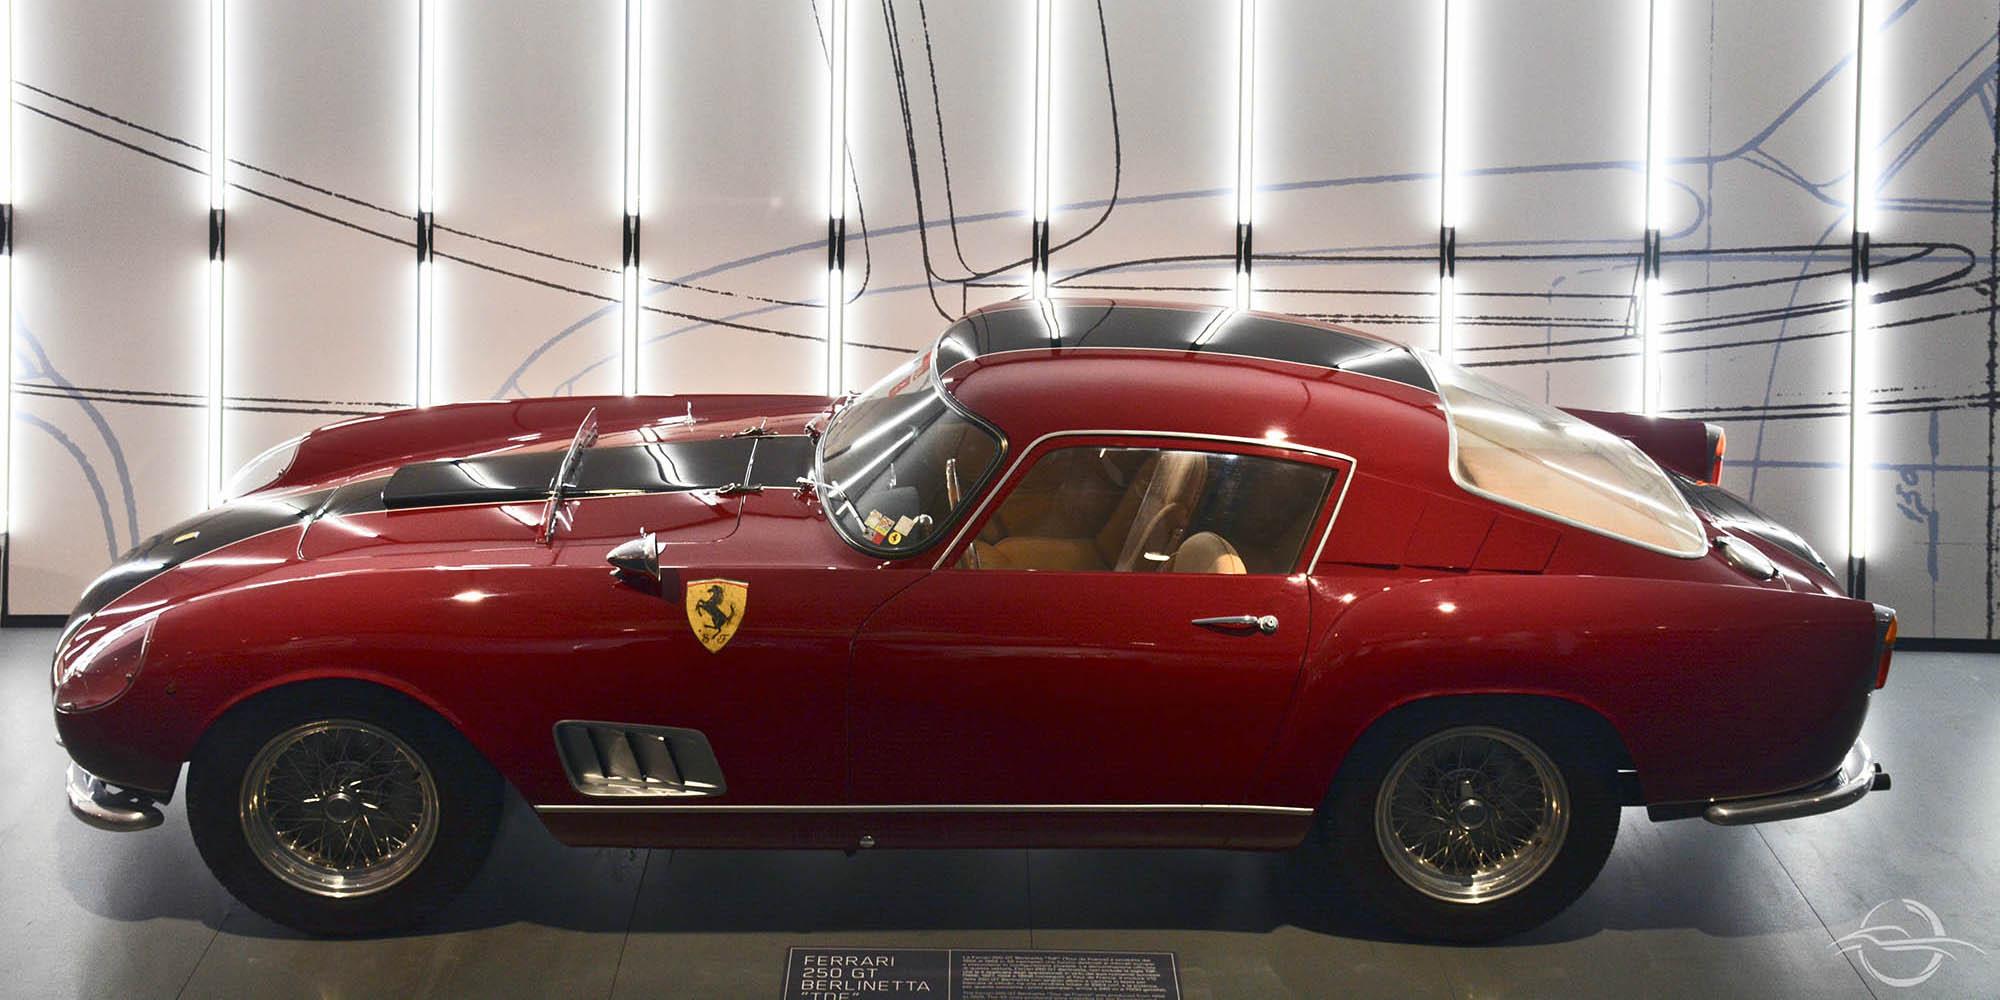 Ferrari 250 GT Berlinetta TDF at Ferrari Maranello Museum